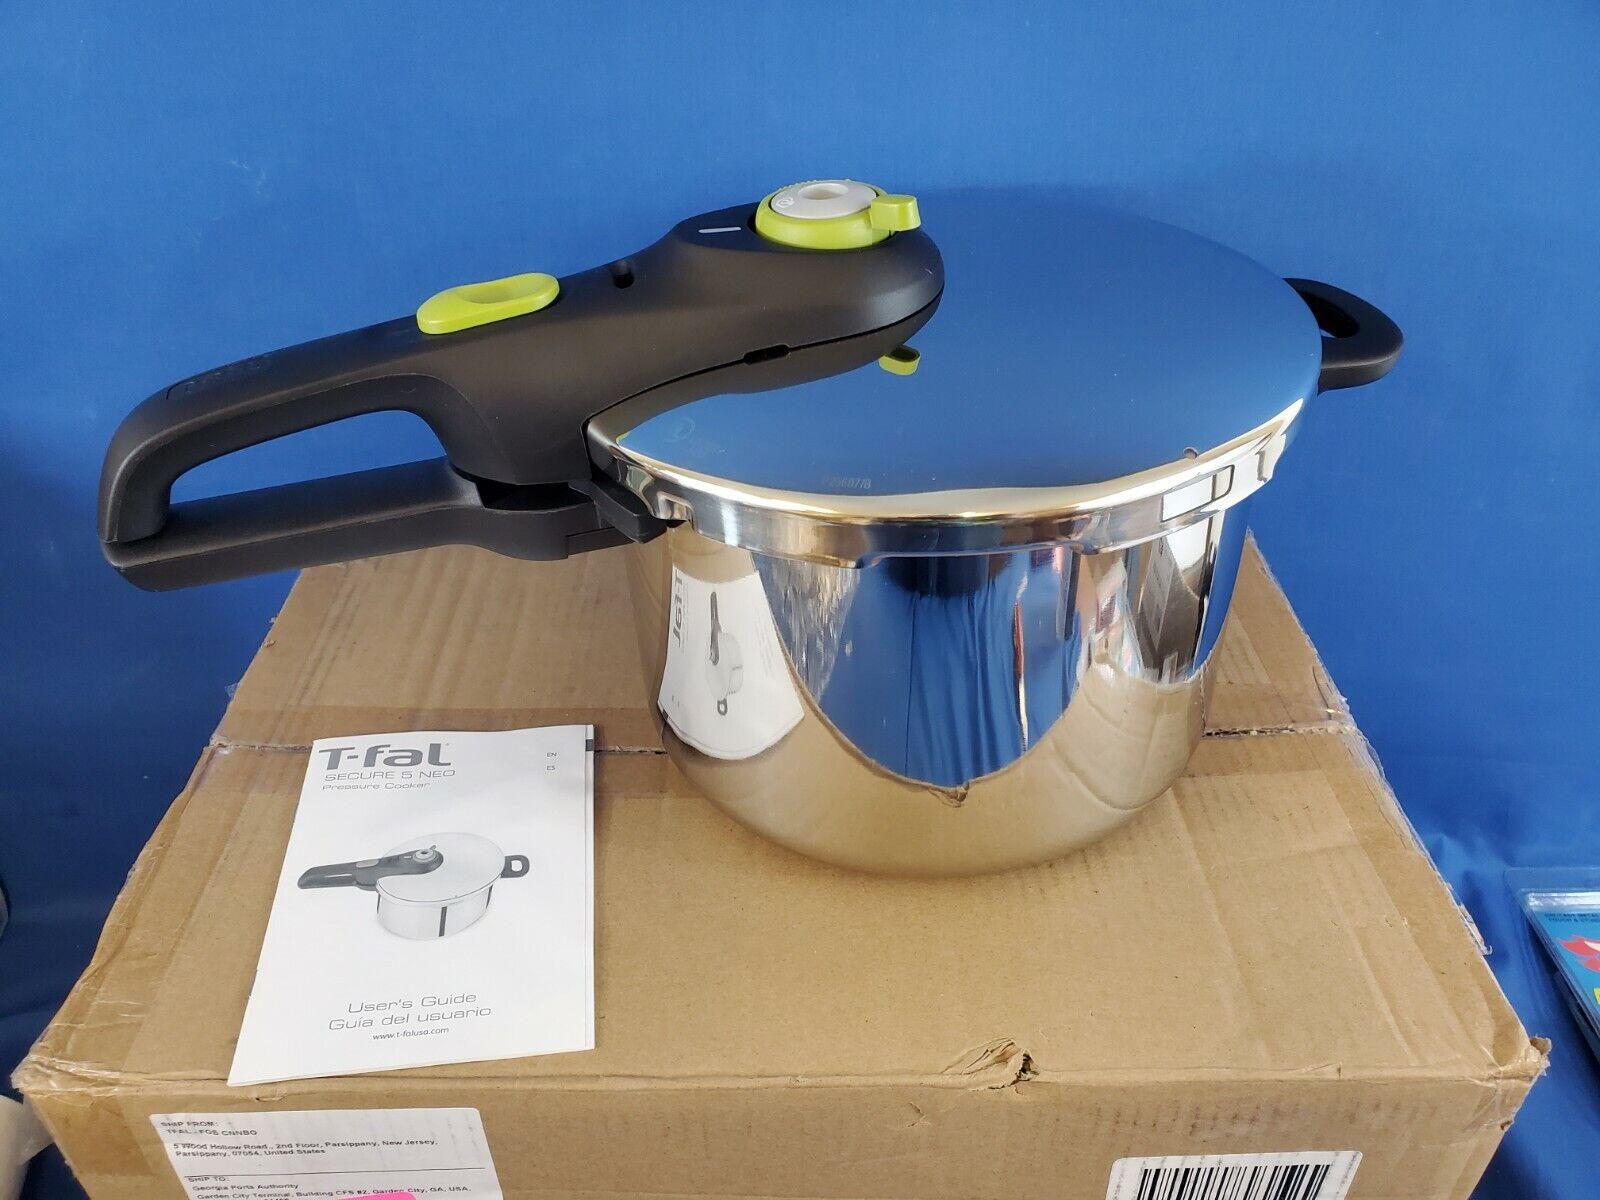 T-fal P25107 Stainless Steel Dishwasher Safe PFOA Free Press